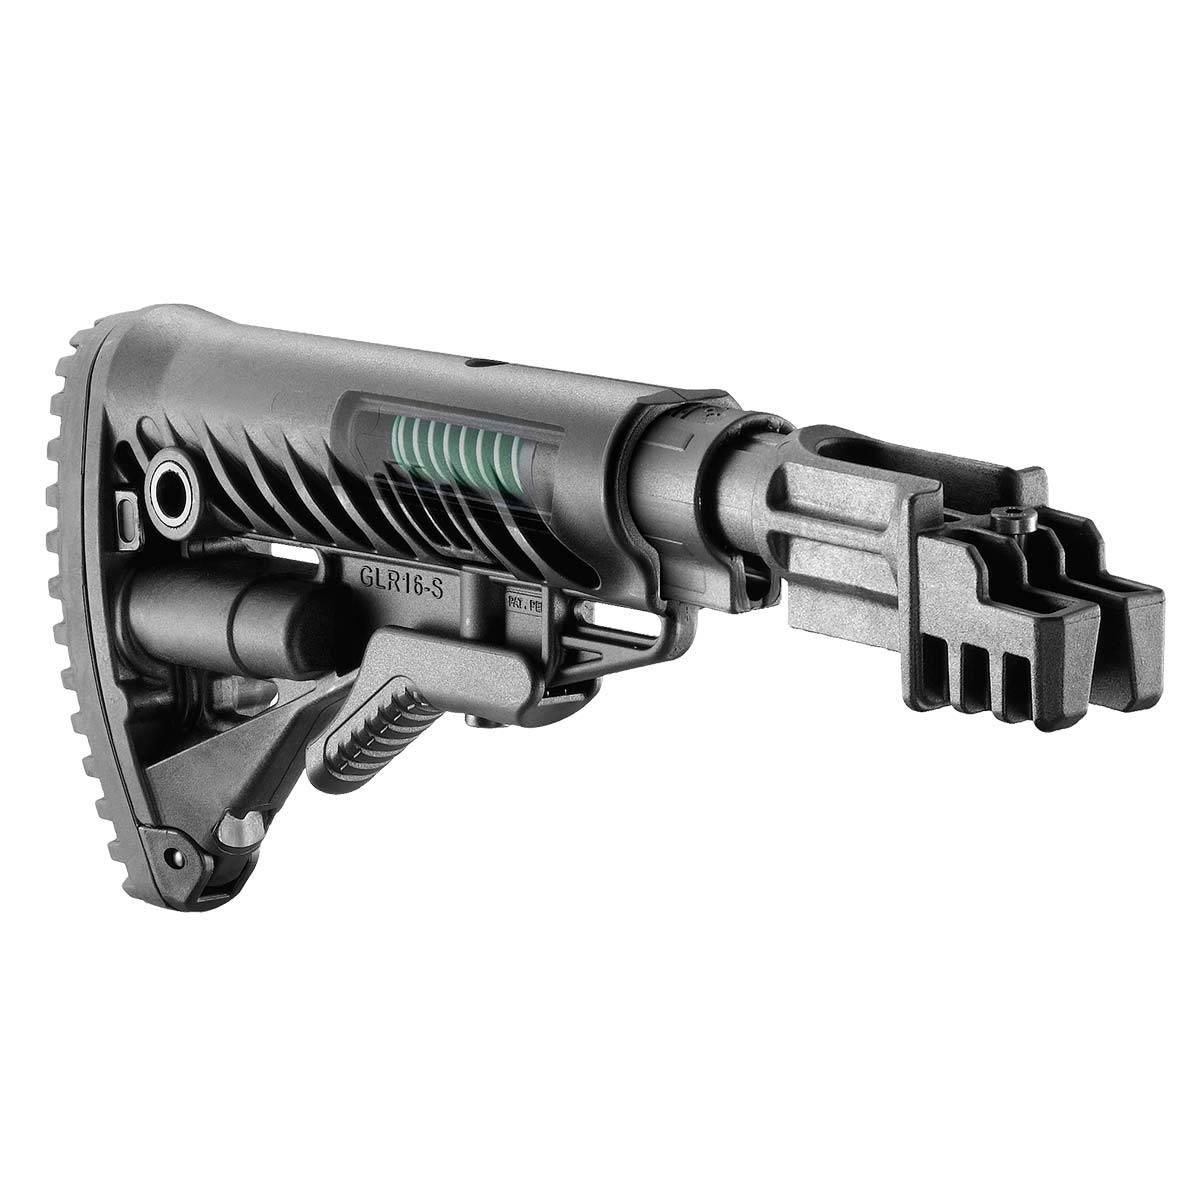 fab-defense-shock-absorbing-ak-47-buffer-tube-2